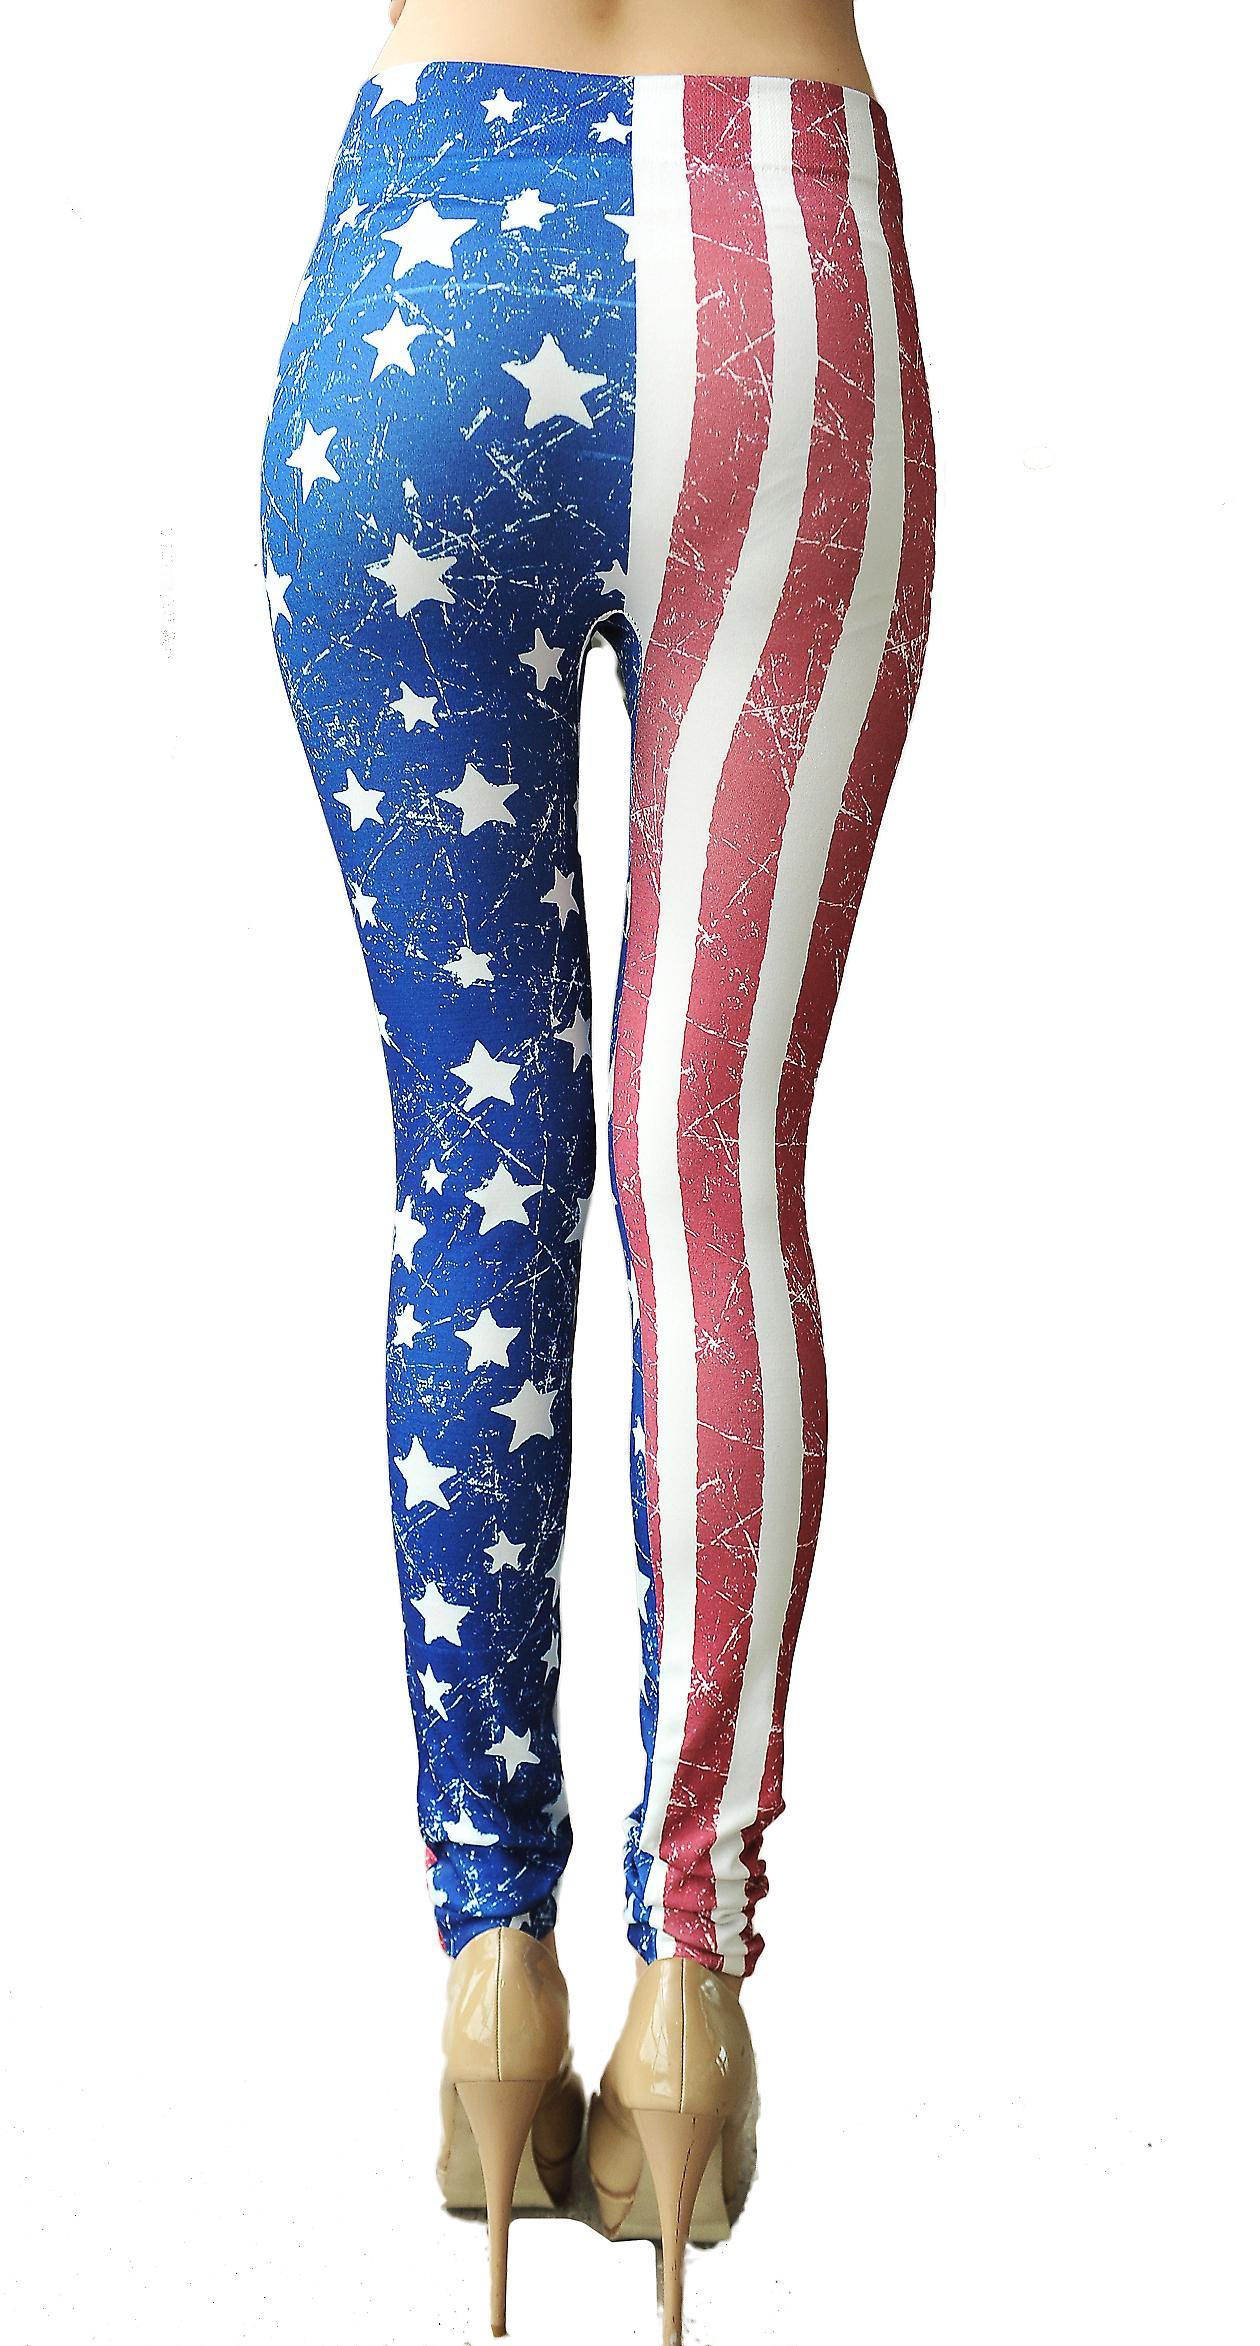 Waooh - Fashion - Legging American flag motif vintage